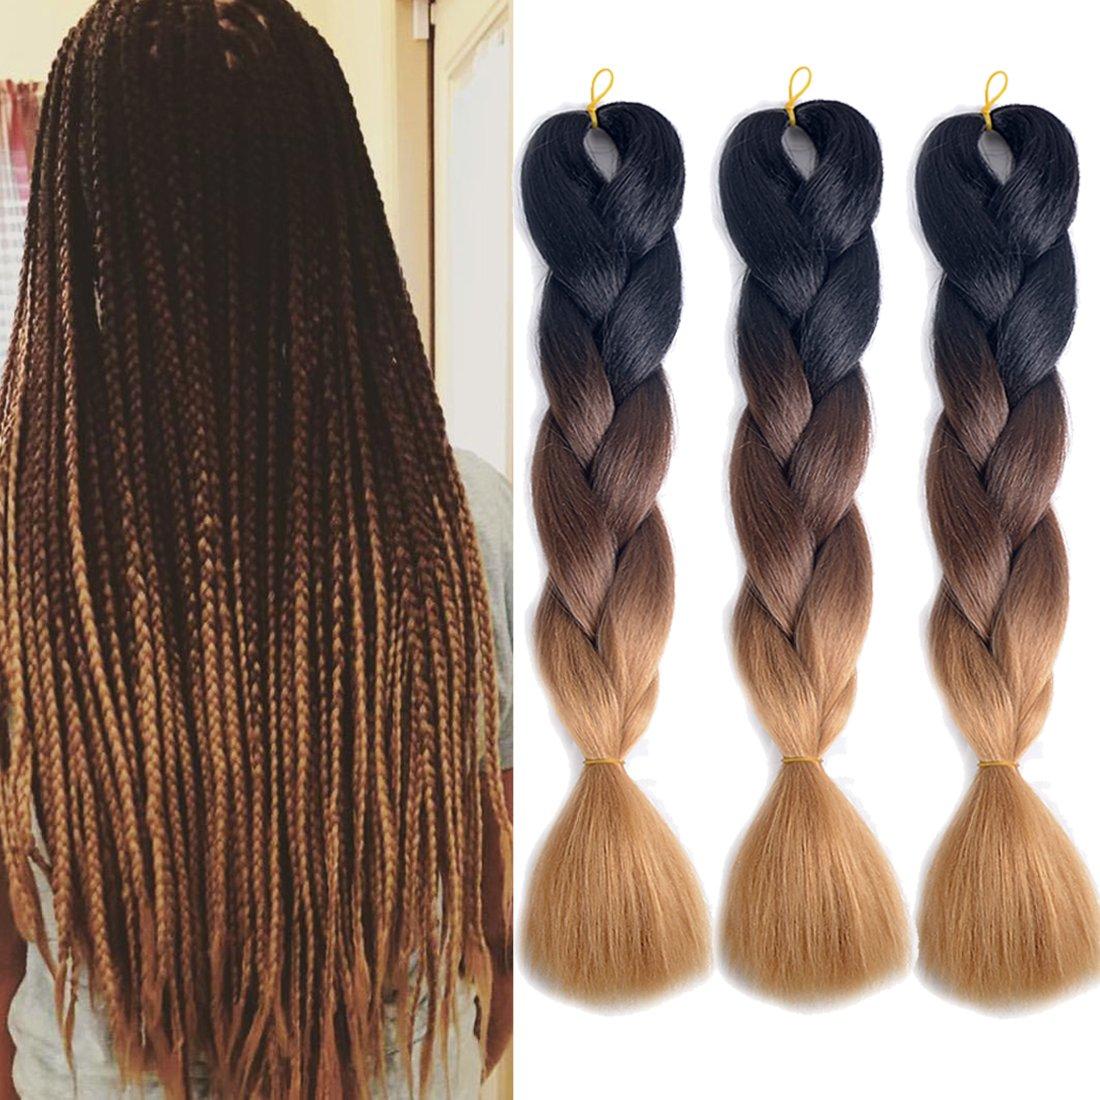 Amazon Mshair Ombre Jumbo Braiding Hair Extension Synthetic